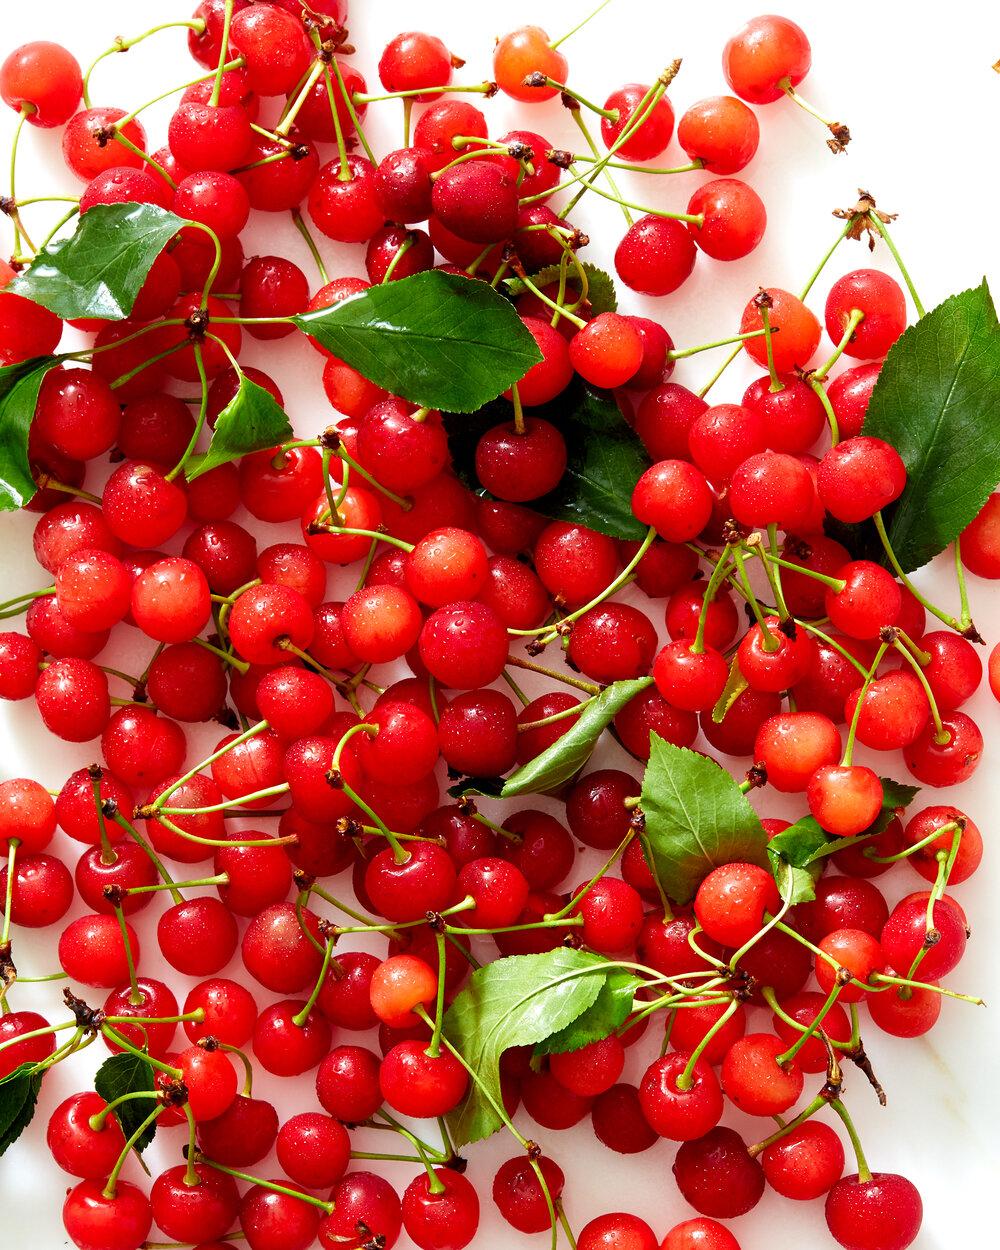 Cherries4206.jpg